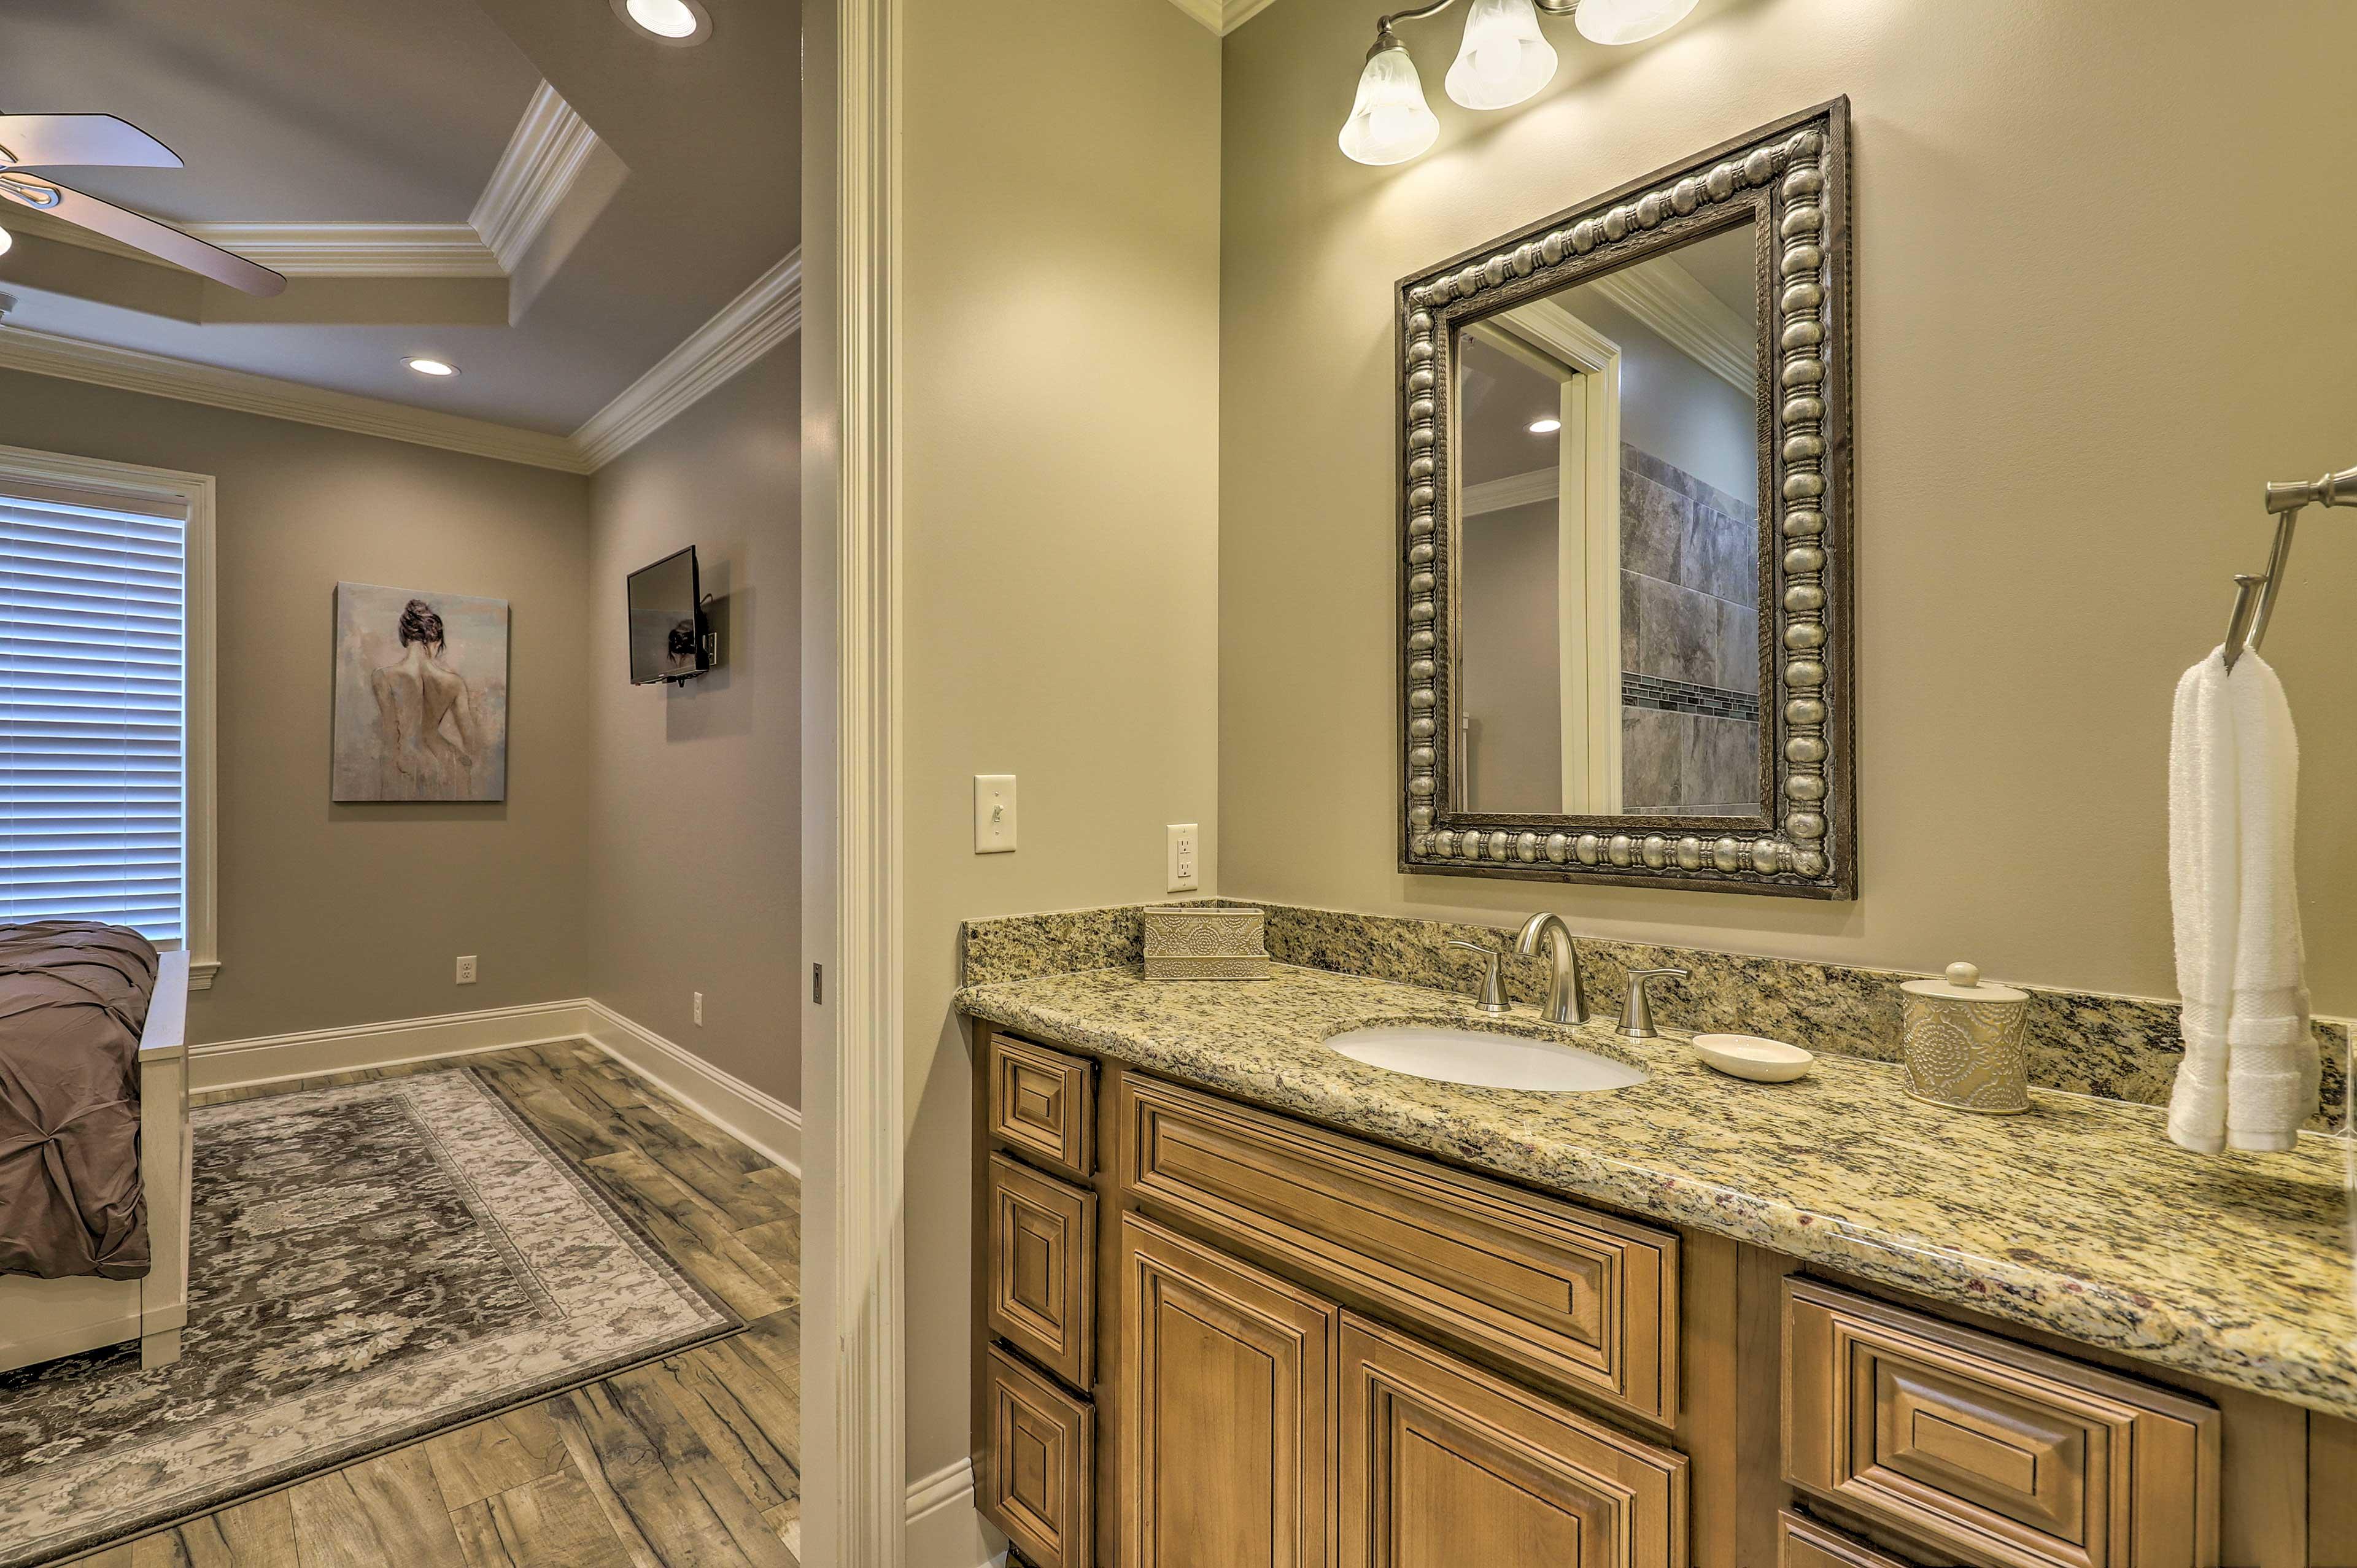 The en-suite features a large vanity.